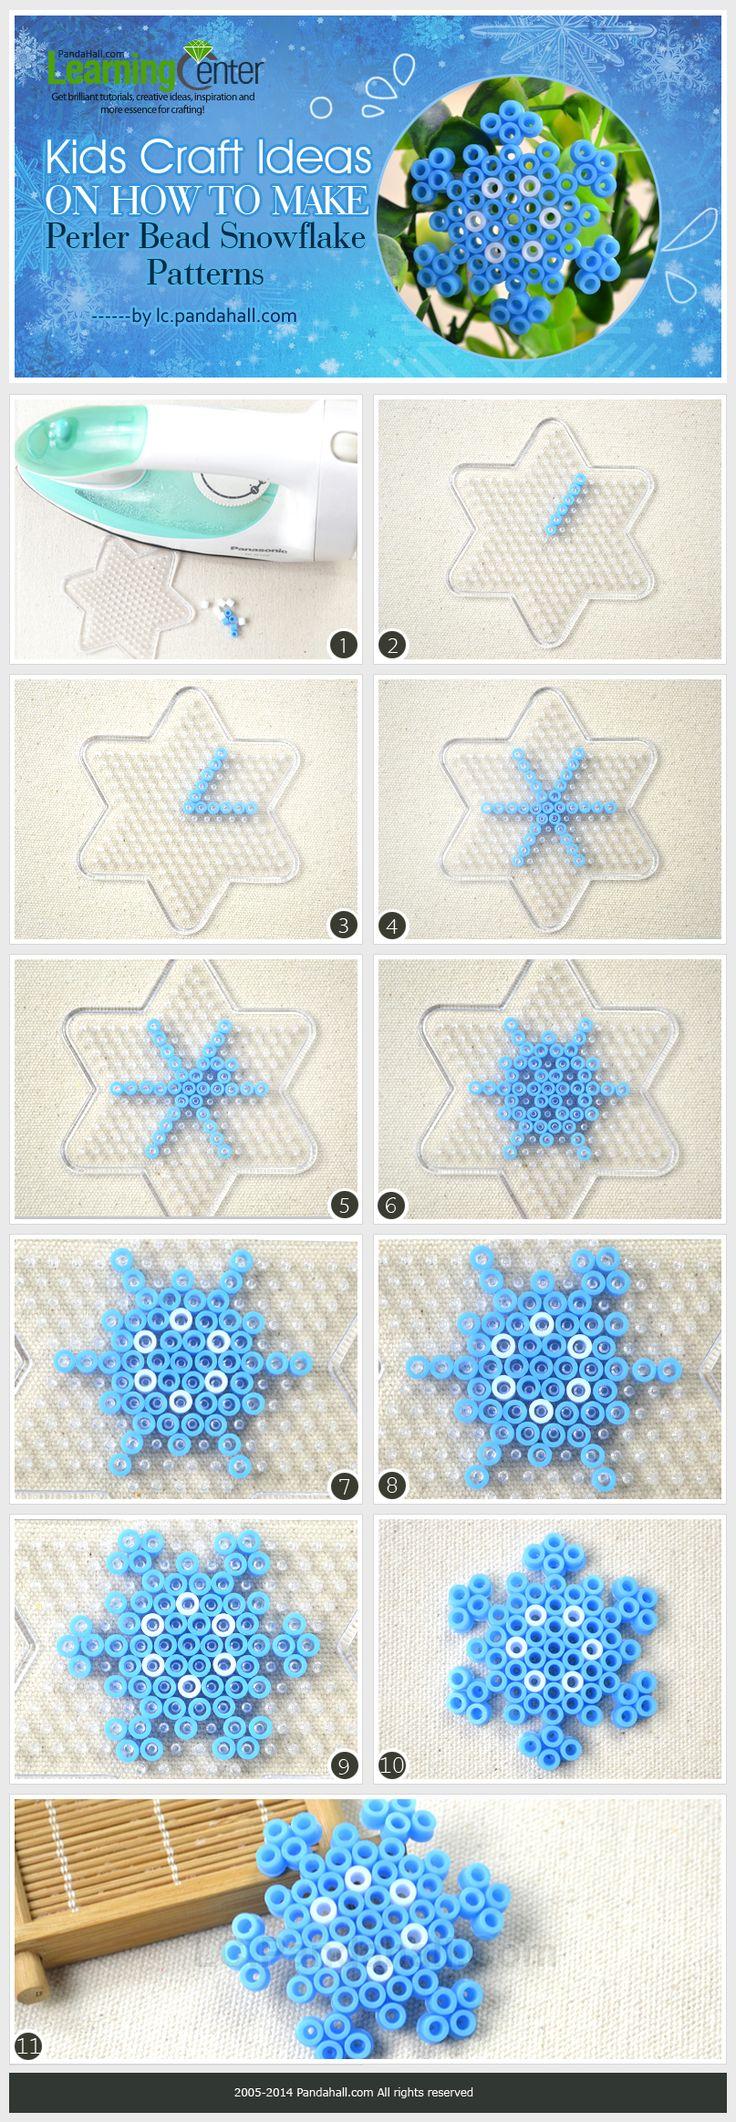 Kids Craft Ideas on How to Make Perler Bead Snowflake Patterns